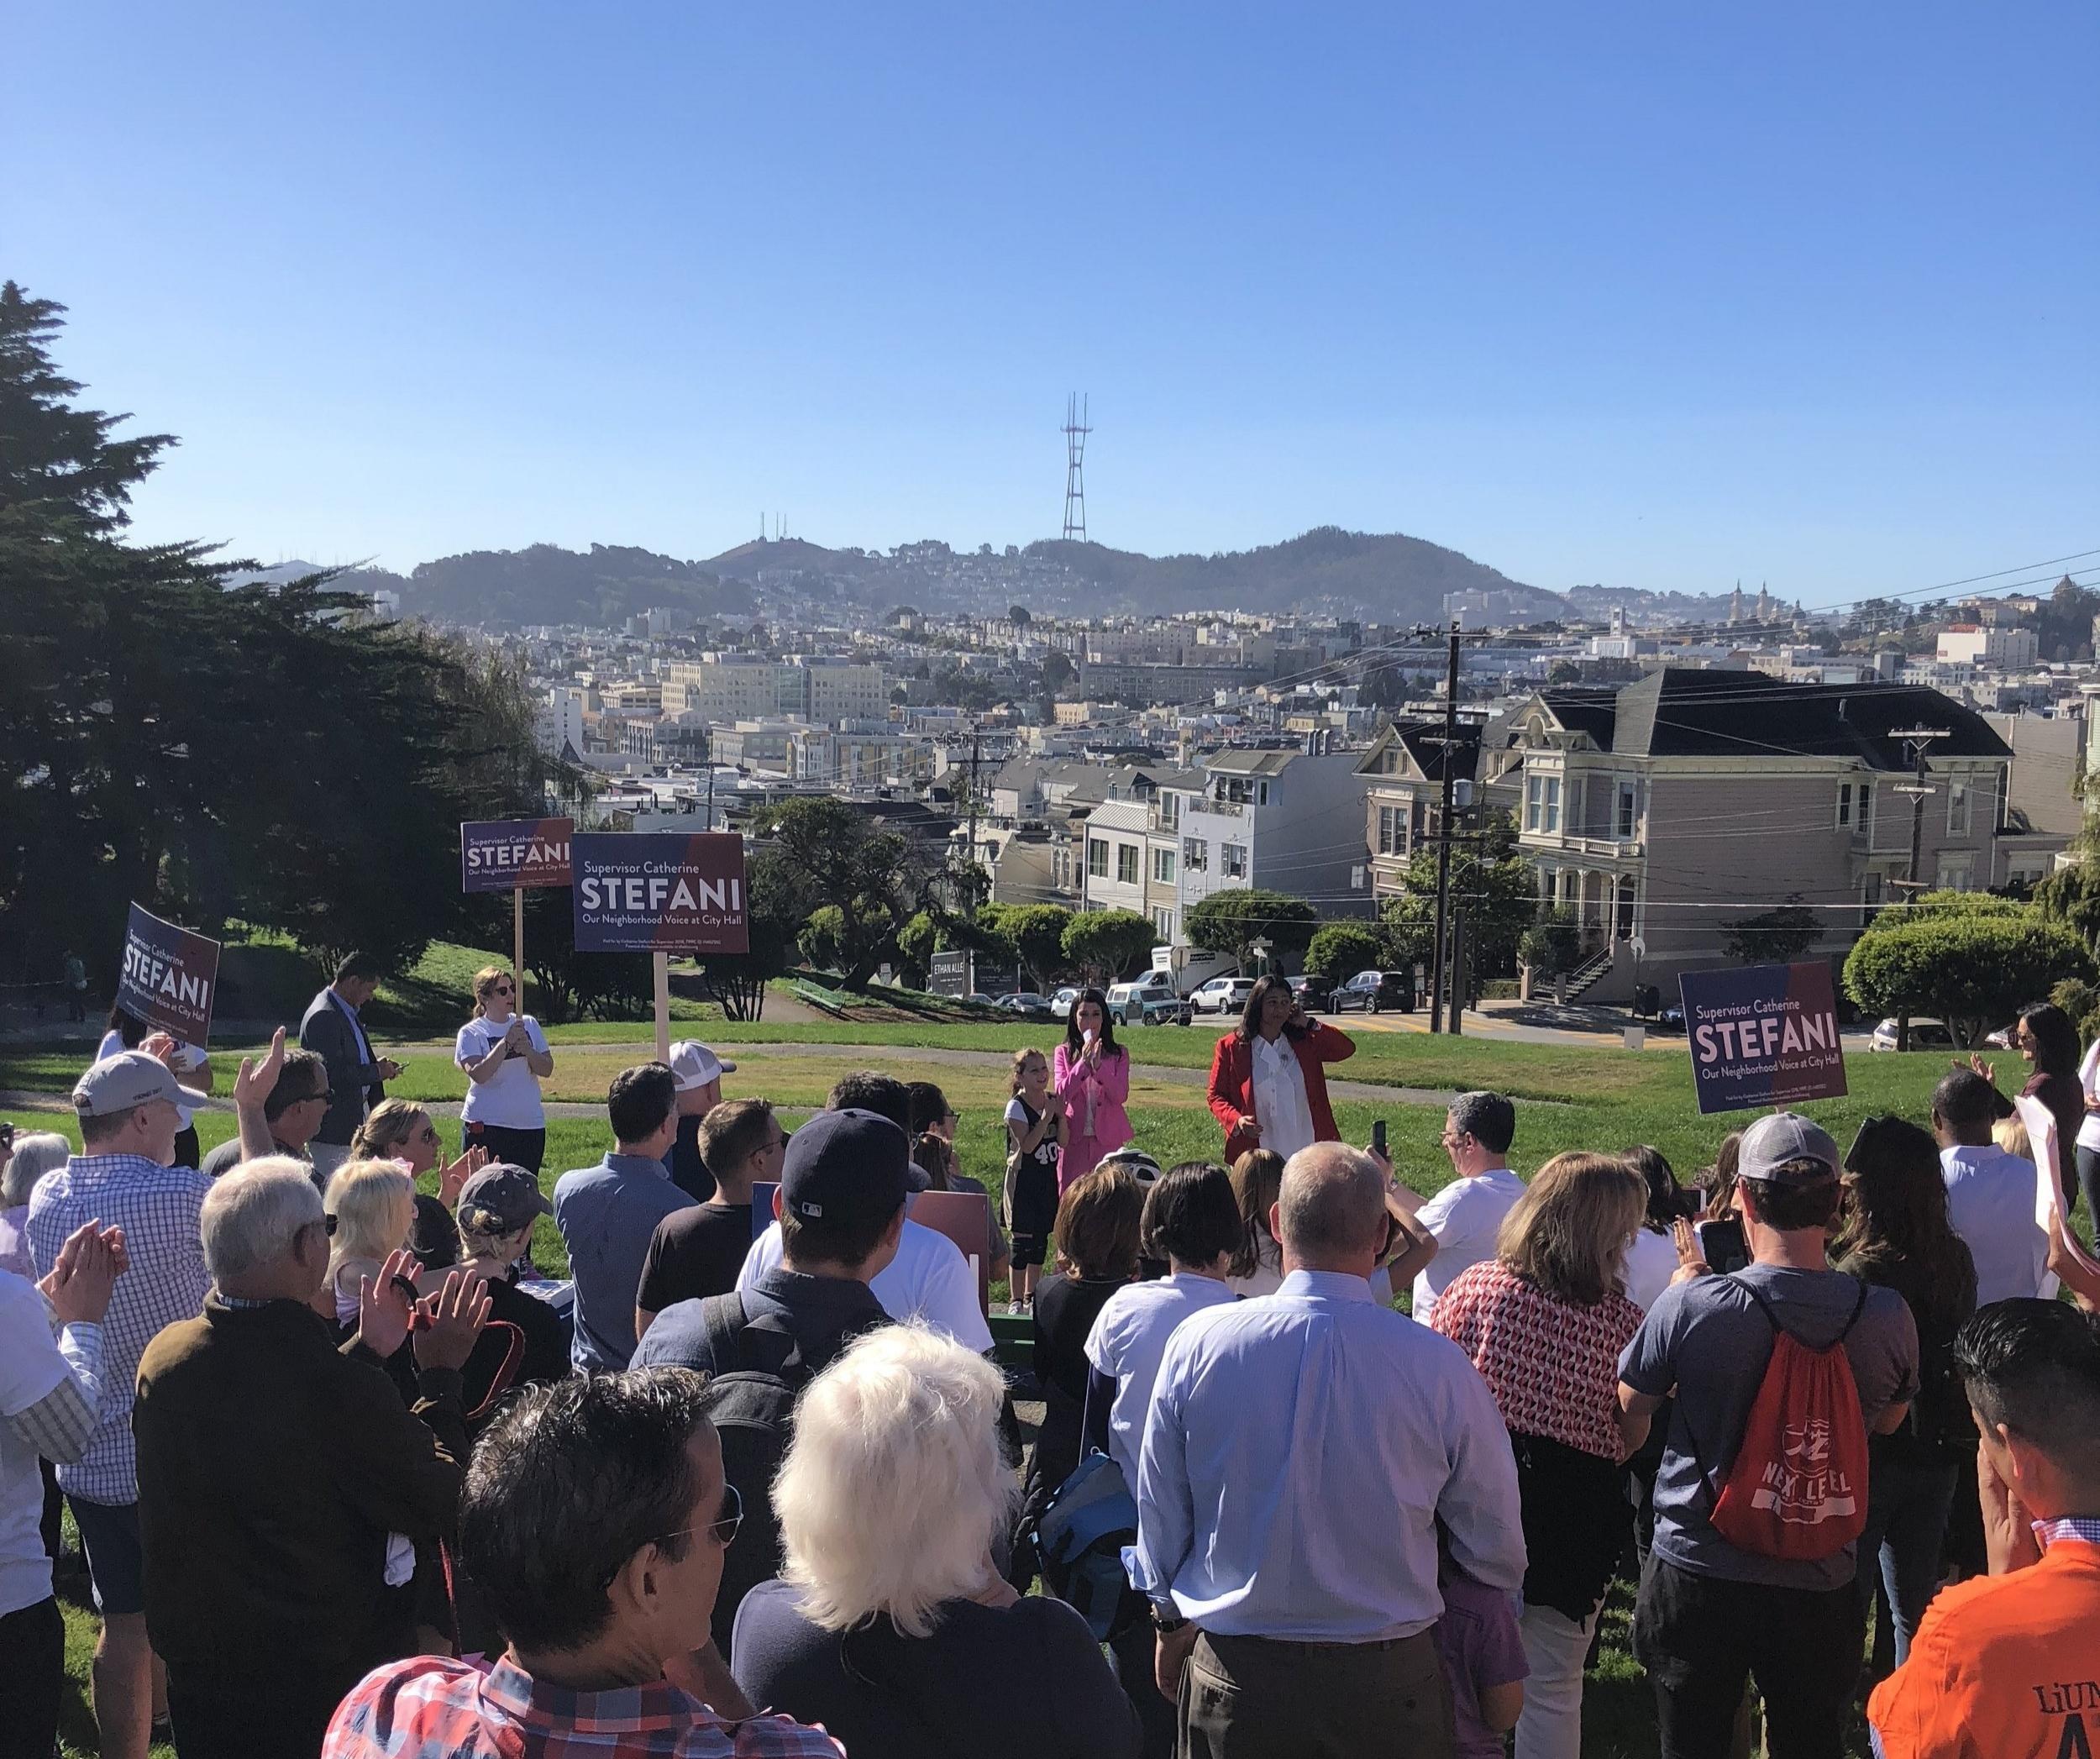 Supervisor Stefani addresses a rally on November 3 at Alta Plaza park